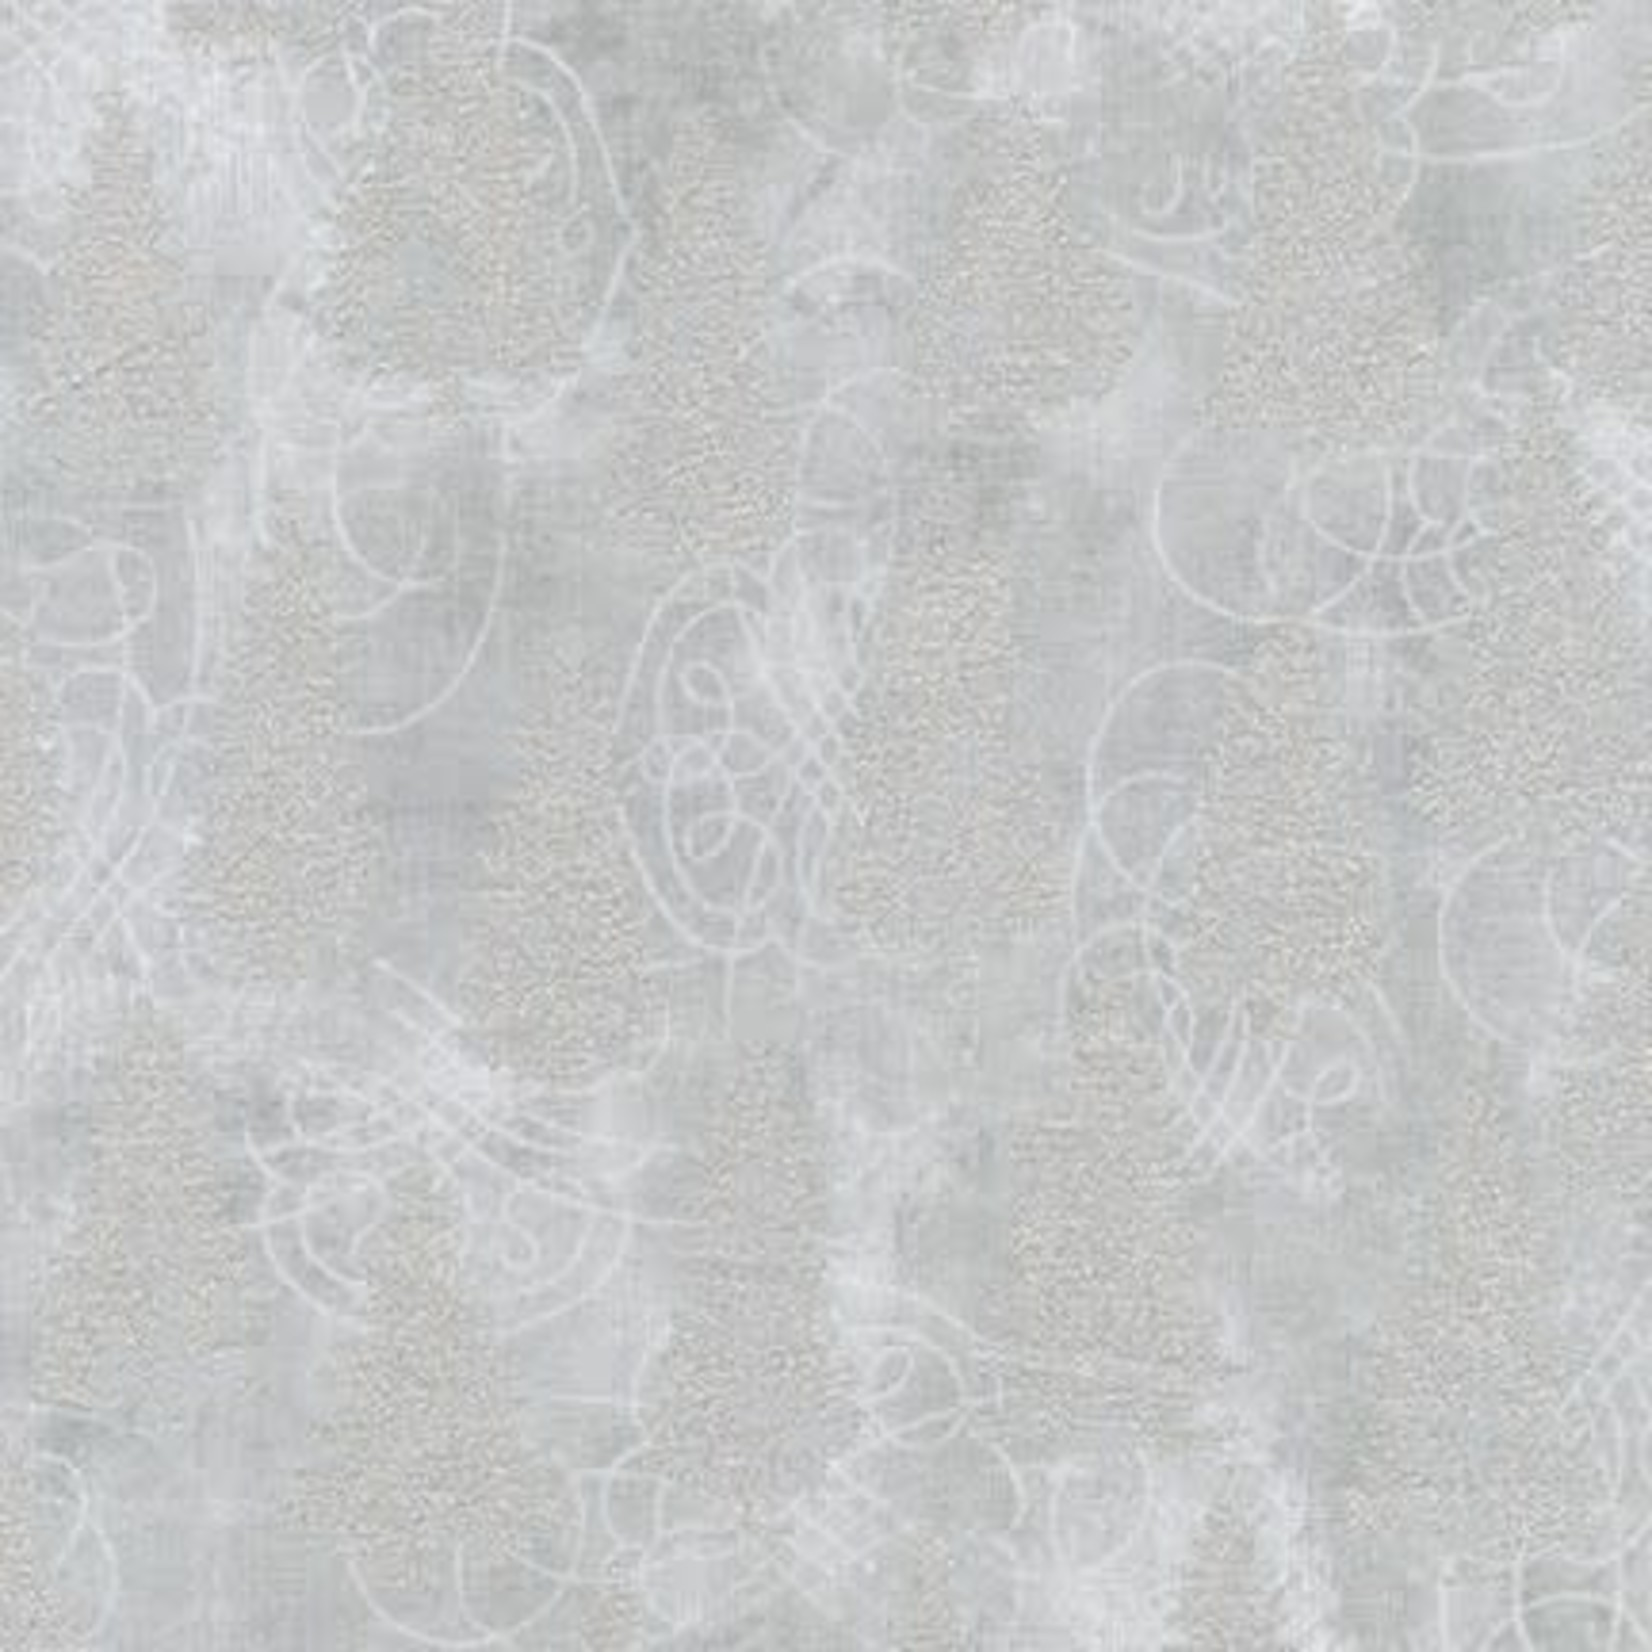 ROBERT KAUFMAN WINTER'S GRANDEUR 8, FILIGREE, SILVER $0.20 /CM OR $20/M